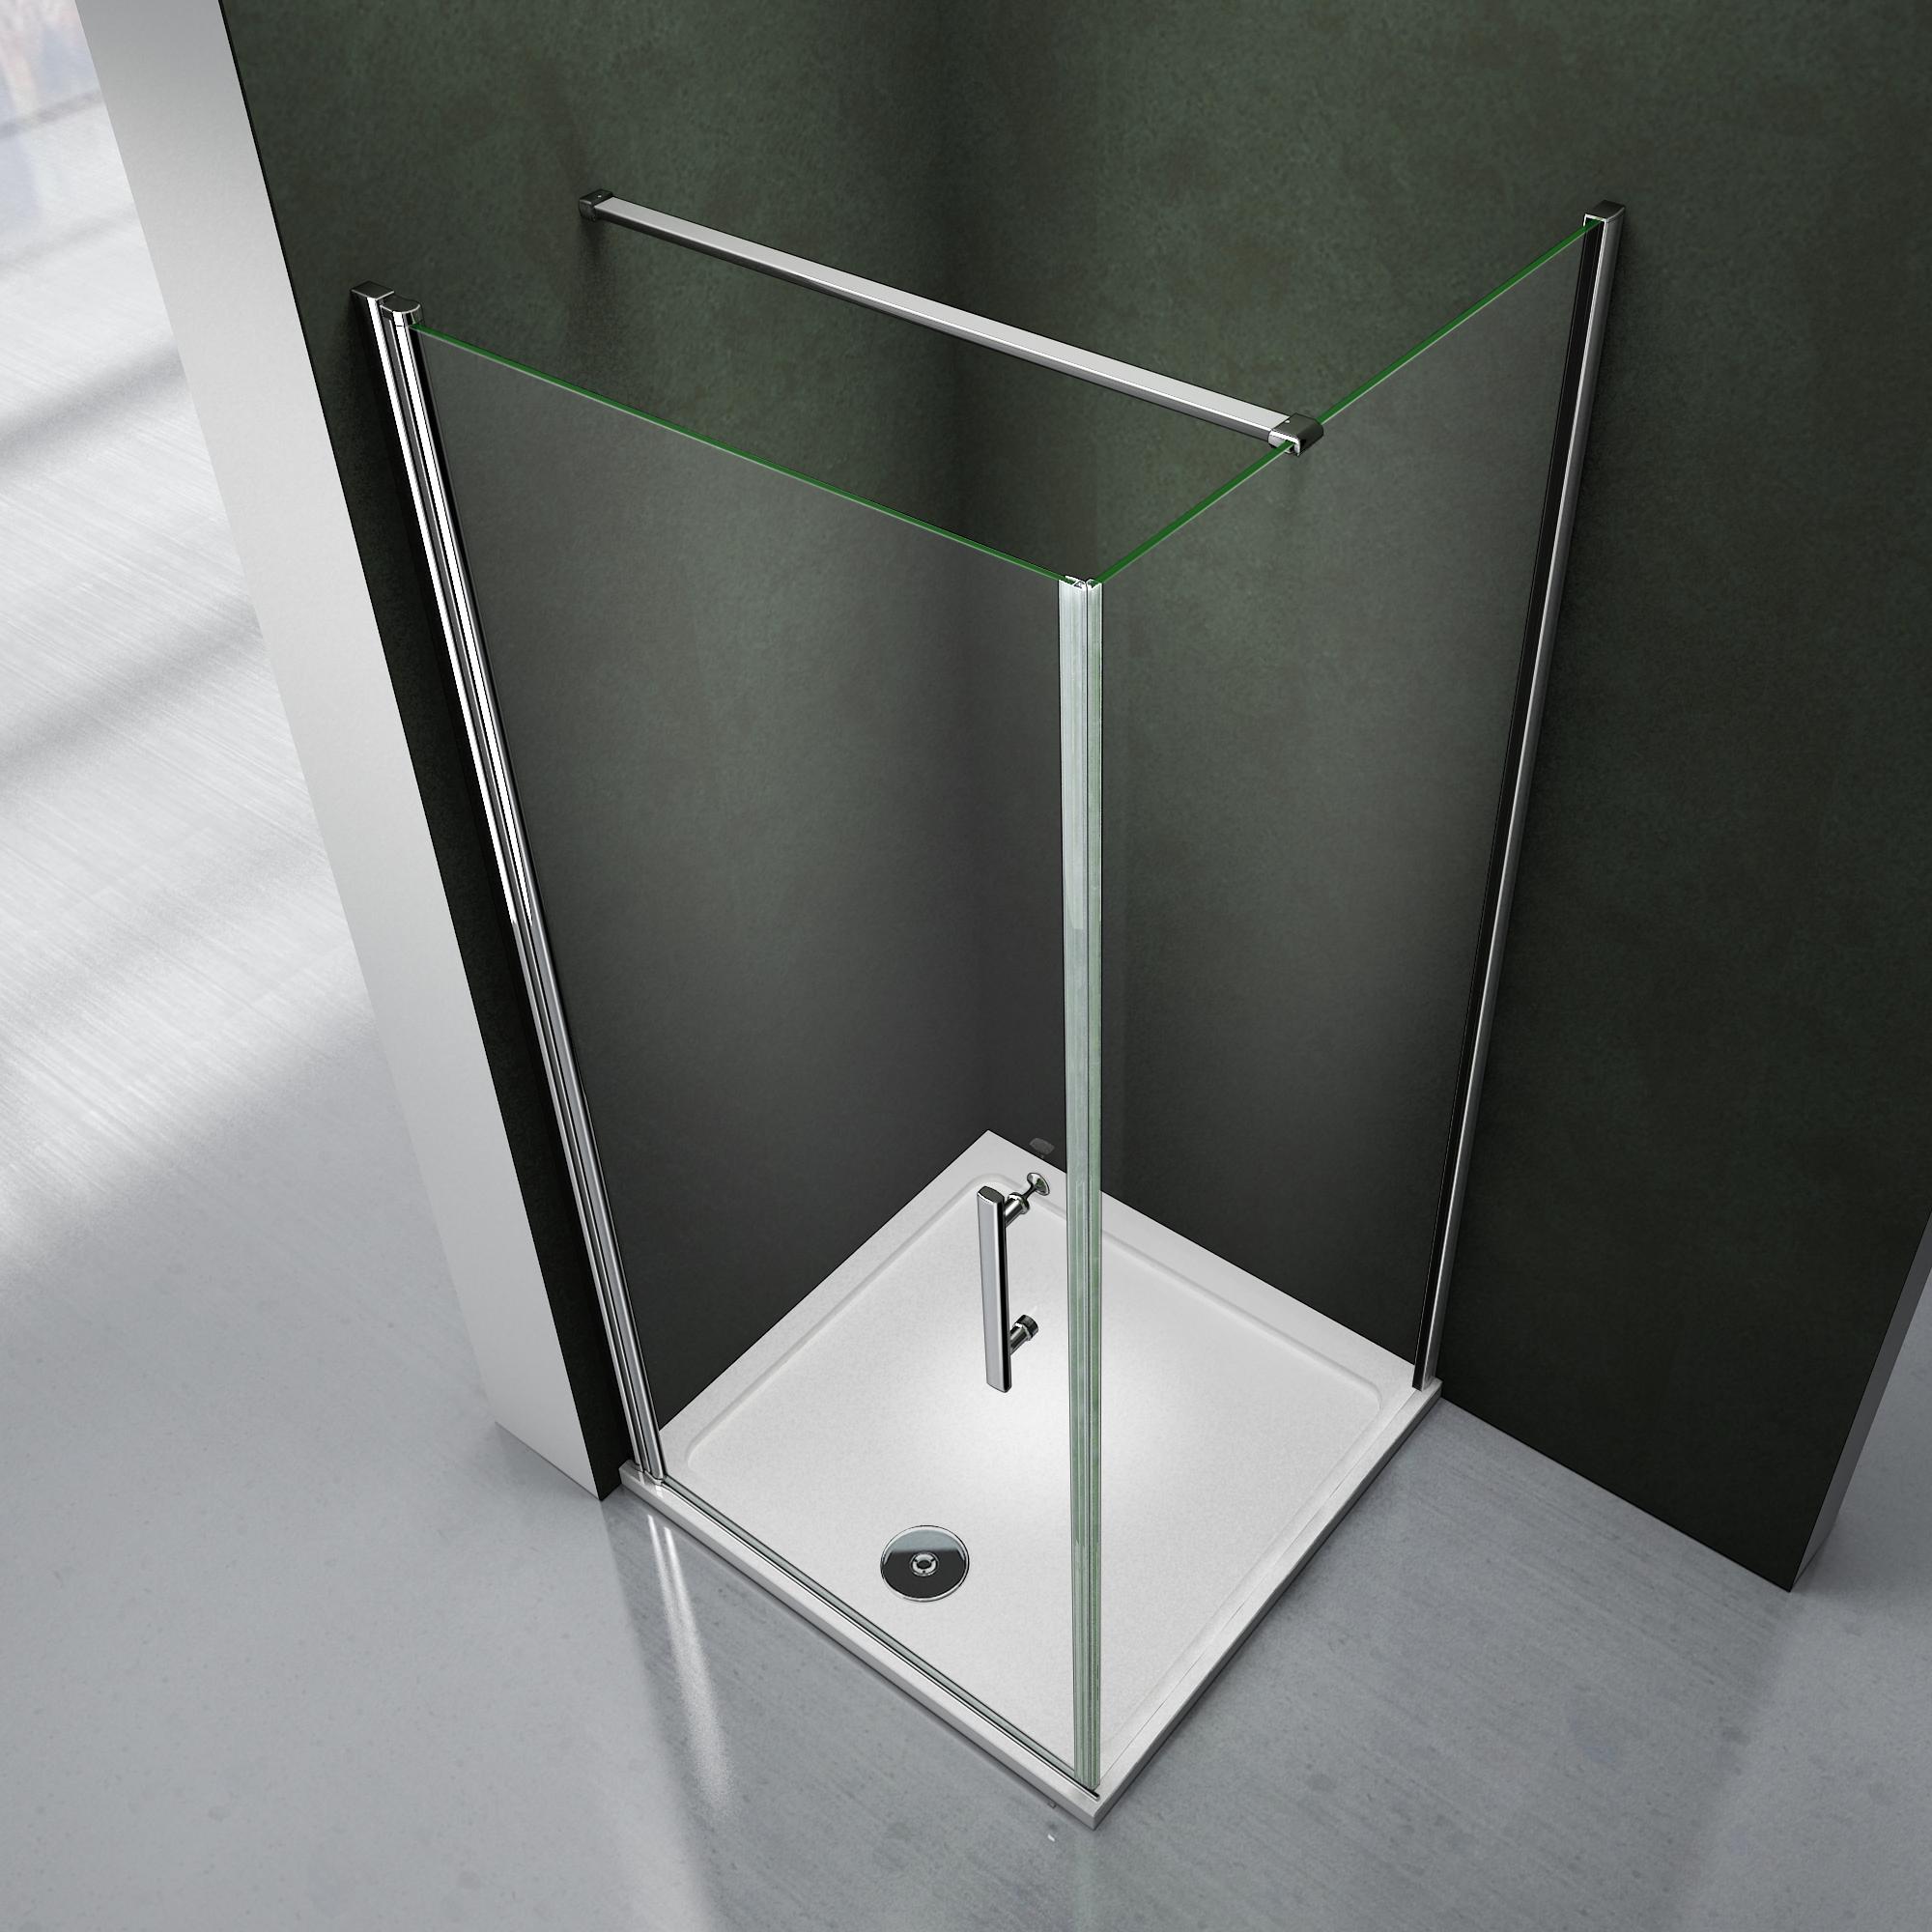 80x80x195cm porte pivotante porte de douche paroi de - Fixation porte de douche ...